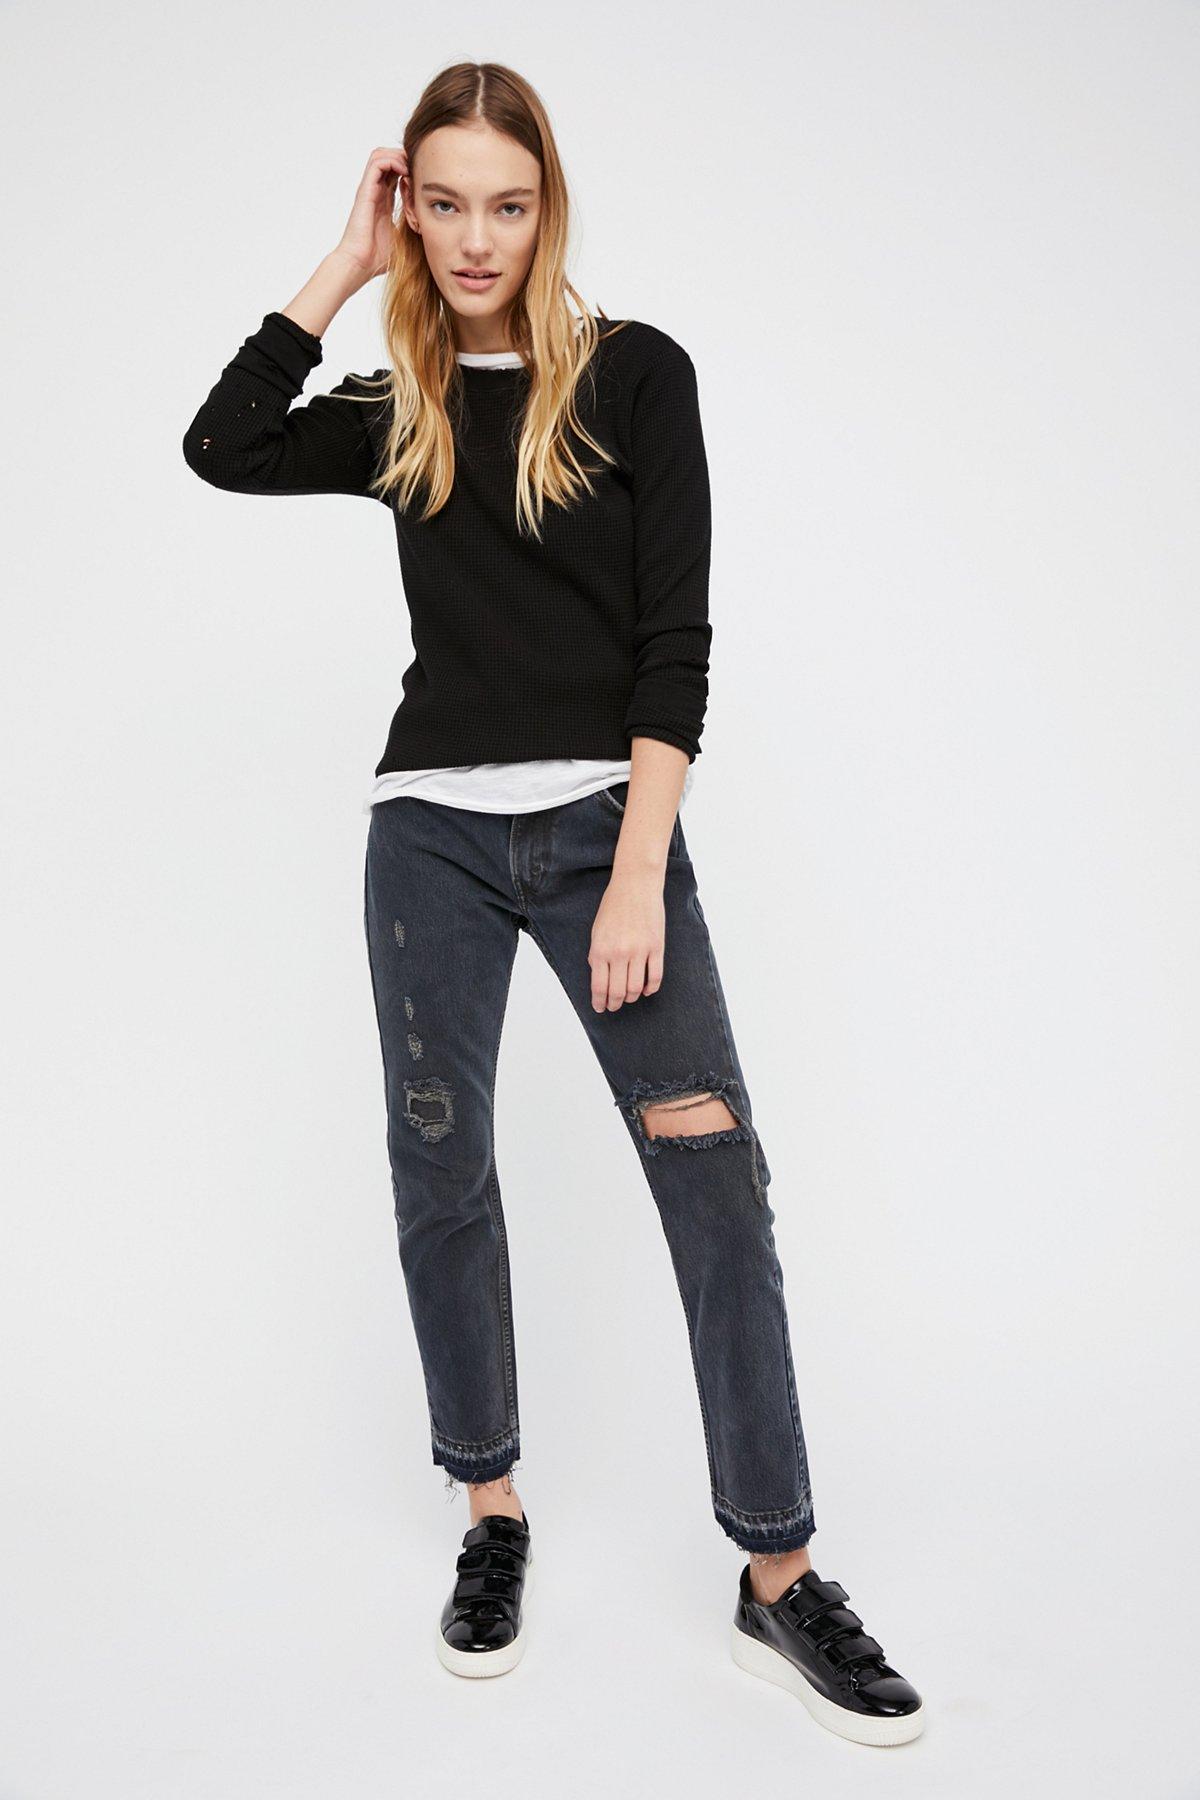 501c Distressed Crop Jeans